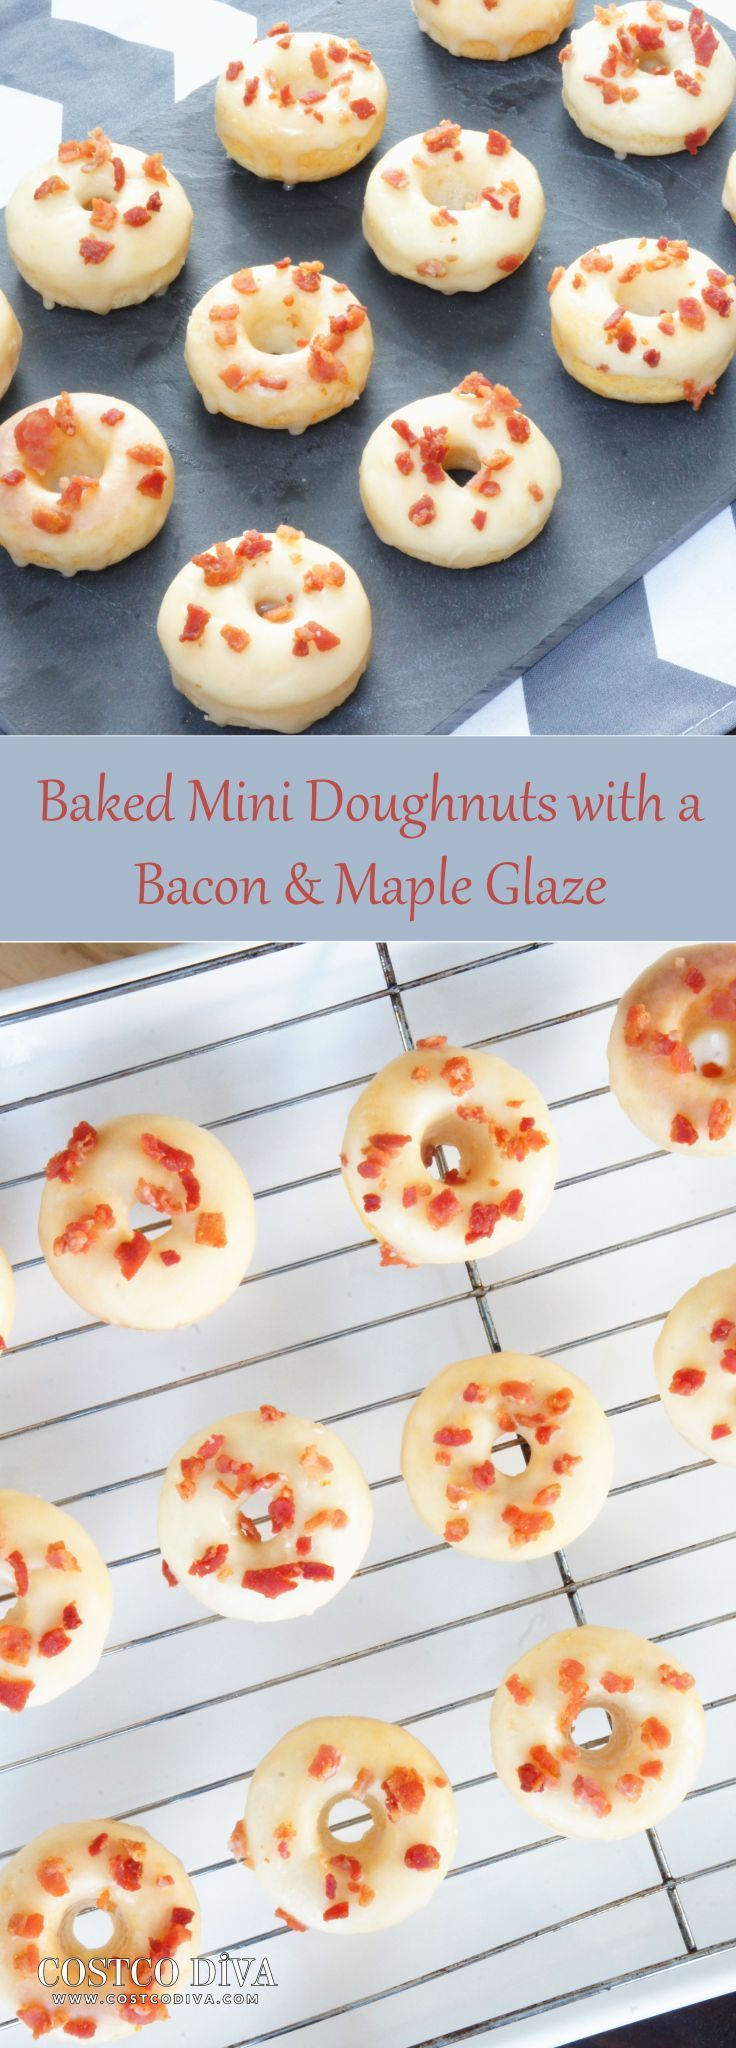 Baked mini doughnuts with a bacon maple glaze costco